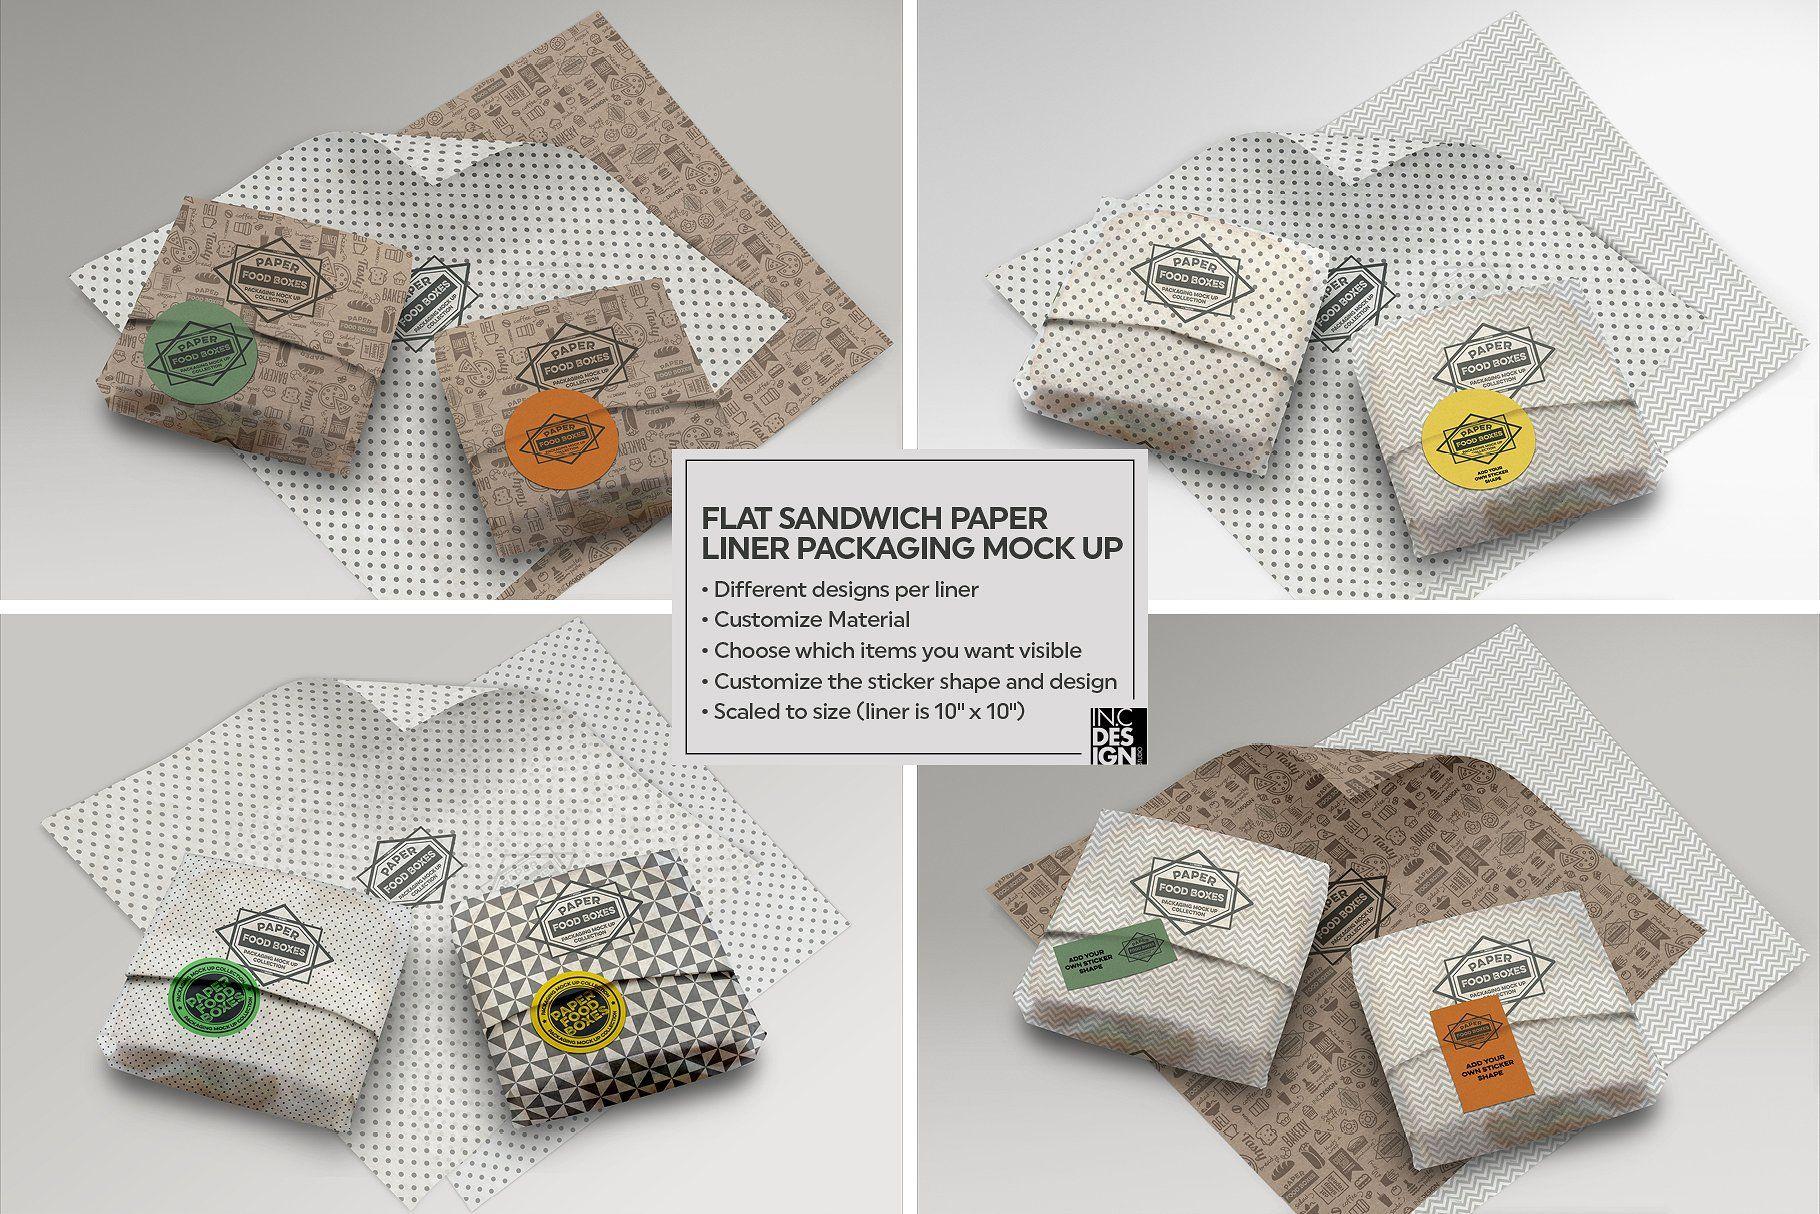 Download Vol 10 Food Box Packaging Mockups Paper Liner Free Packaging Mockup Packaging Mockup